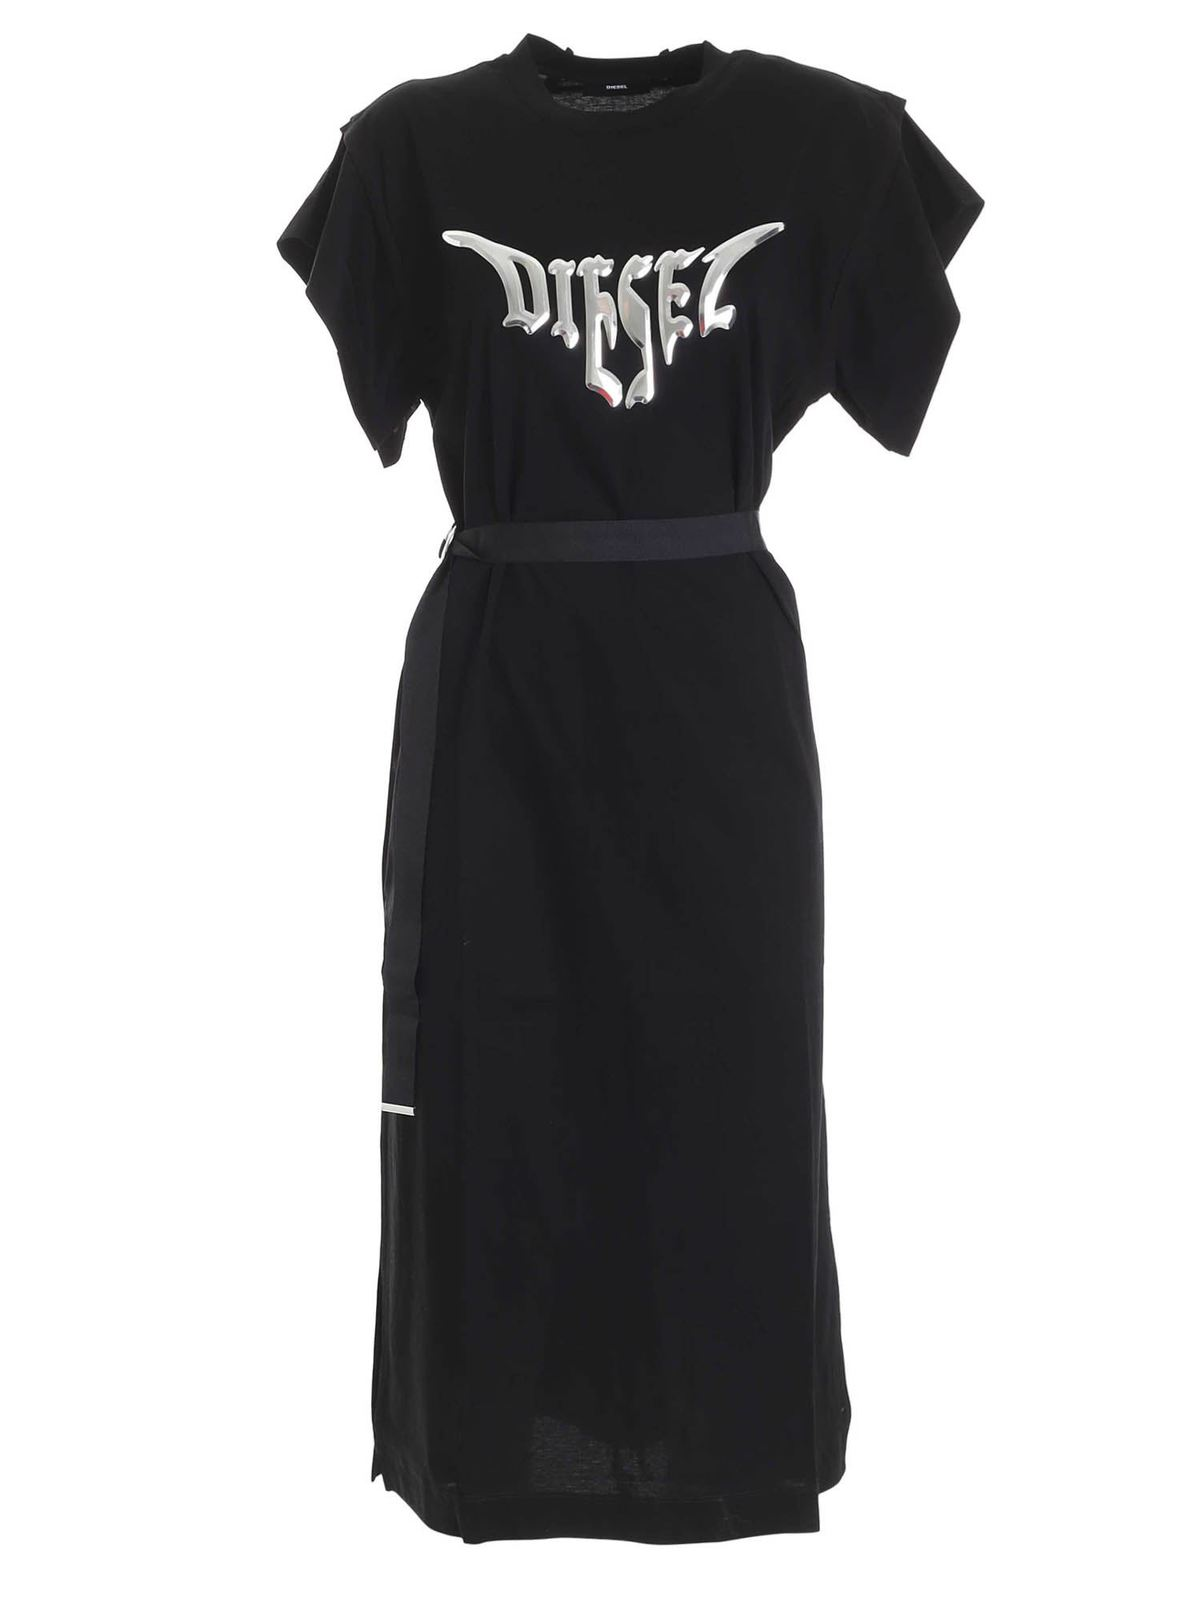 Diesel BRANDED D-FLIX DRESS IN BLACK